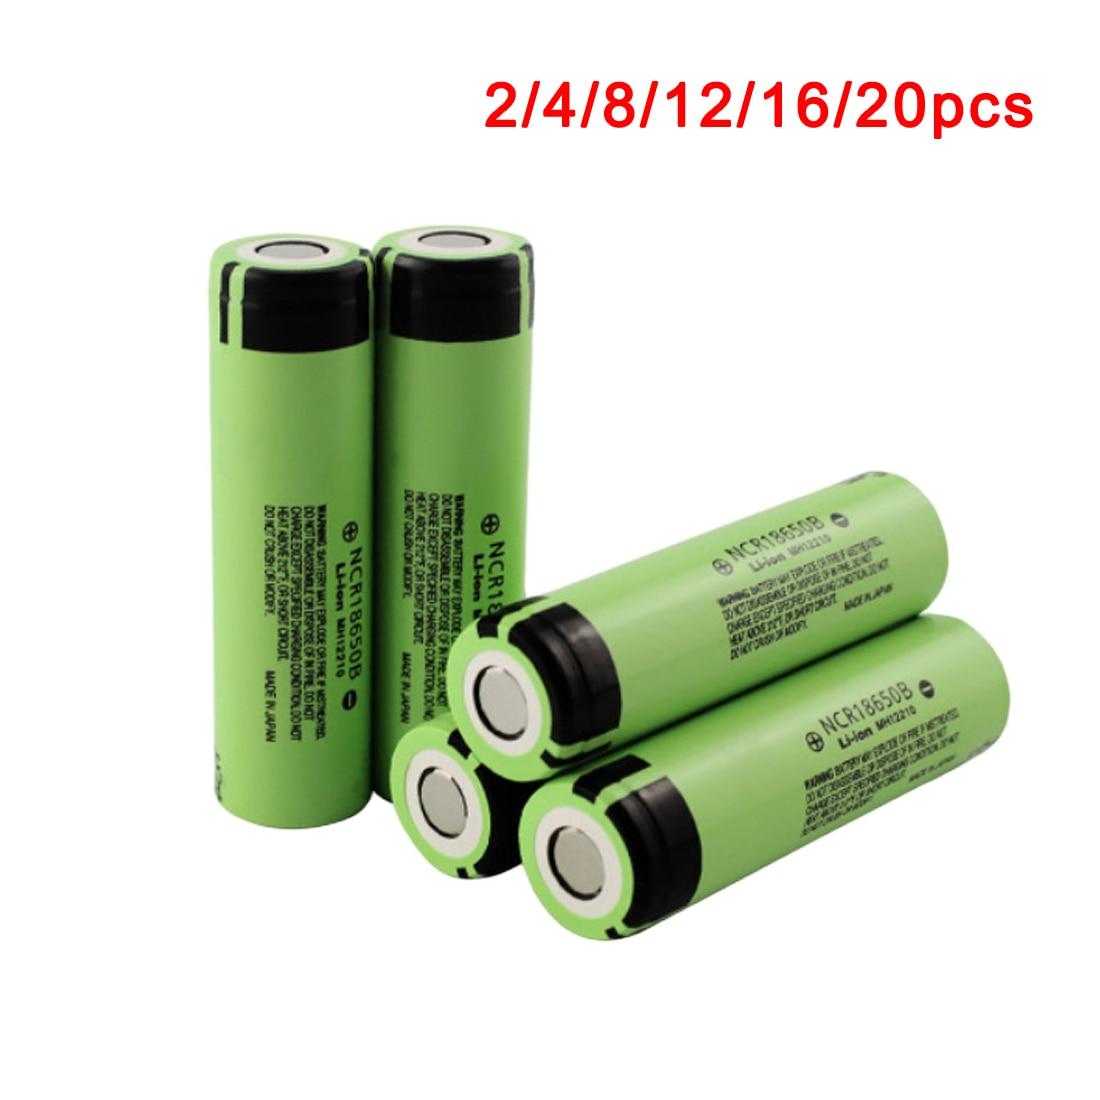 Centechia 2/4/8/12/16/20 STÜCKE 3,7 V NCR 18650B 3400 mAh Wiederaufladbare batterien Für Panasonic 18650 Batterie/Tragbares Ladegerät/Licht